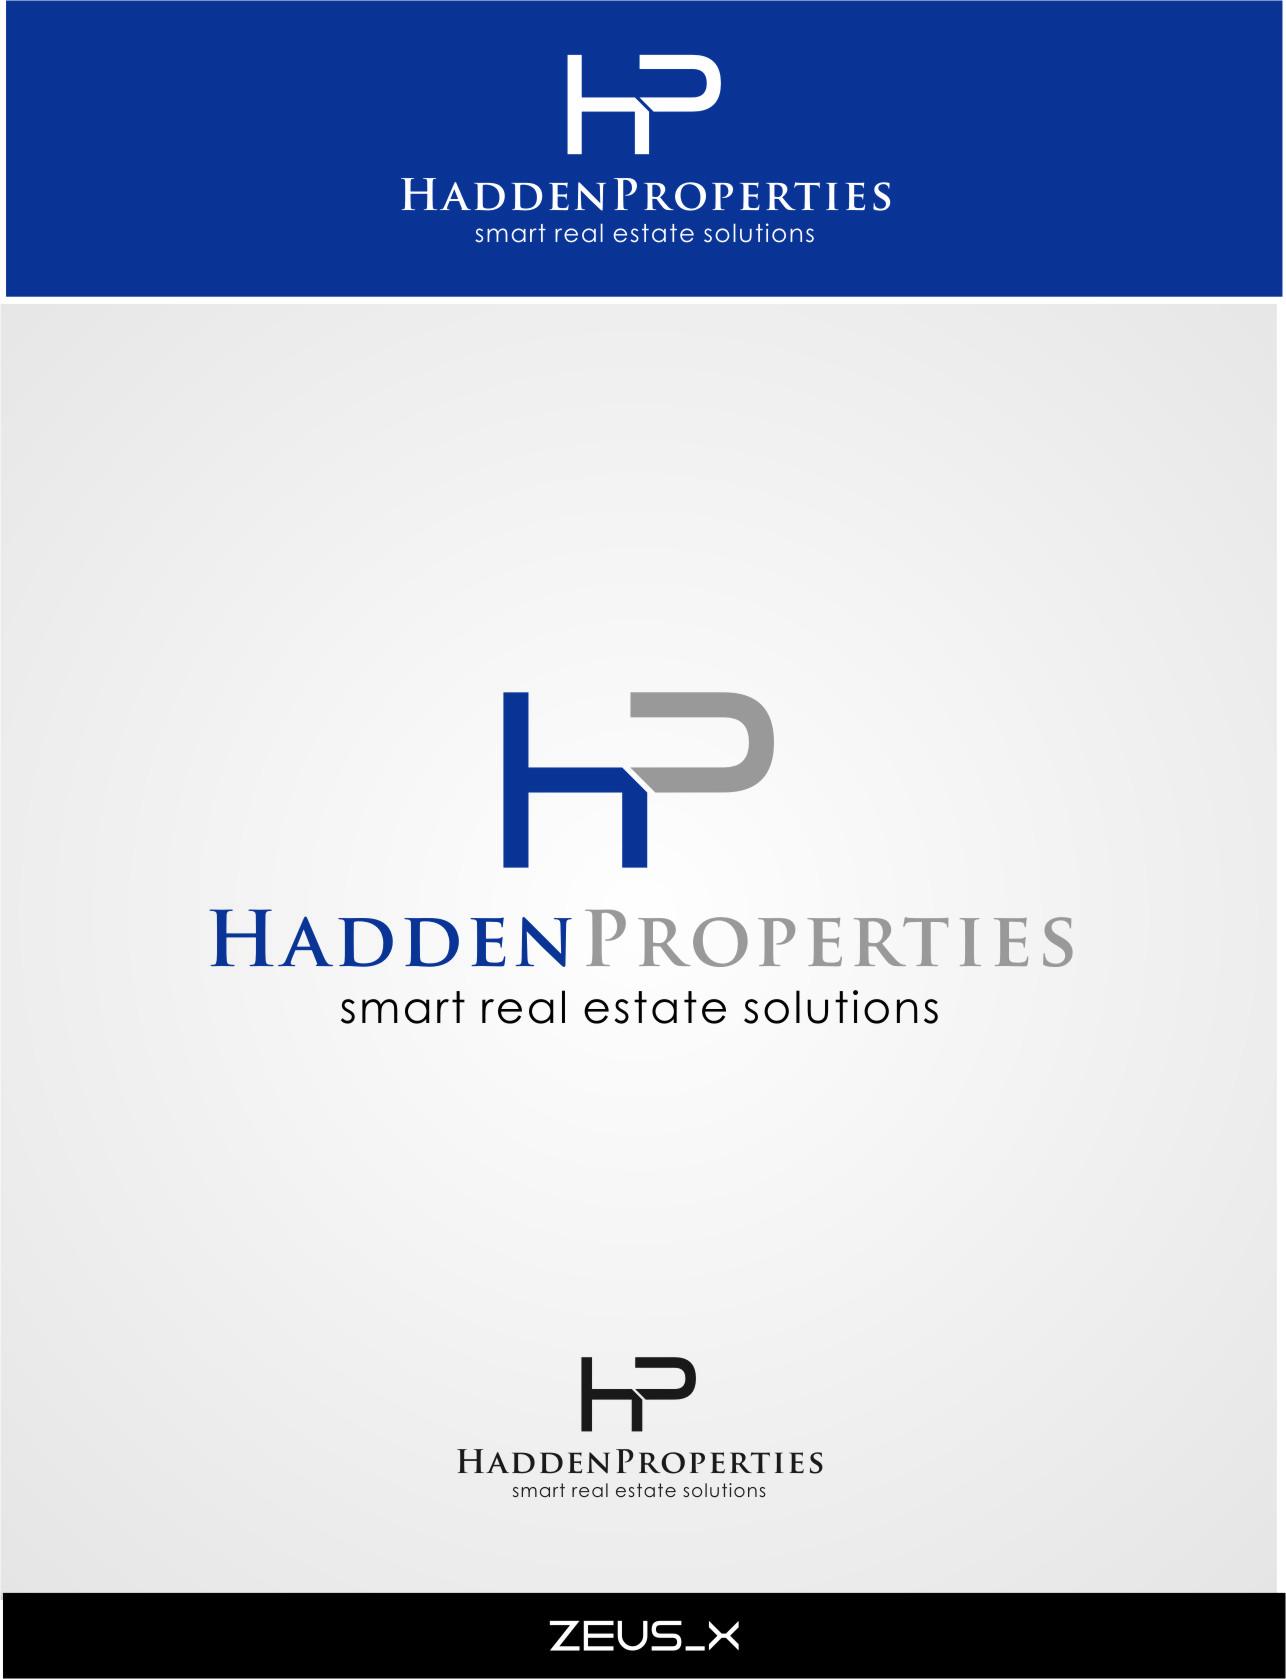 Logo Design by RasYa Muhammad Athaya - Entry No. 91 in the Logo Design Contest Artistic Logo Design for Hadden Properties.